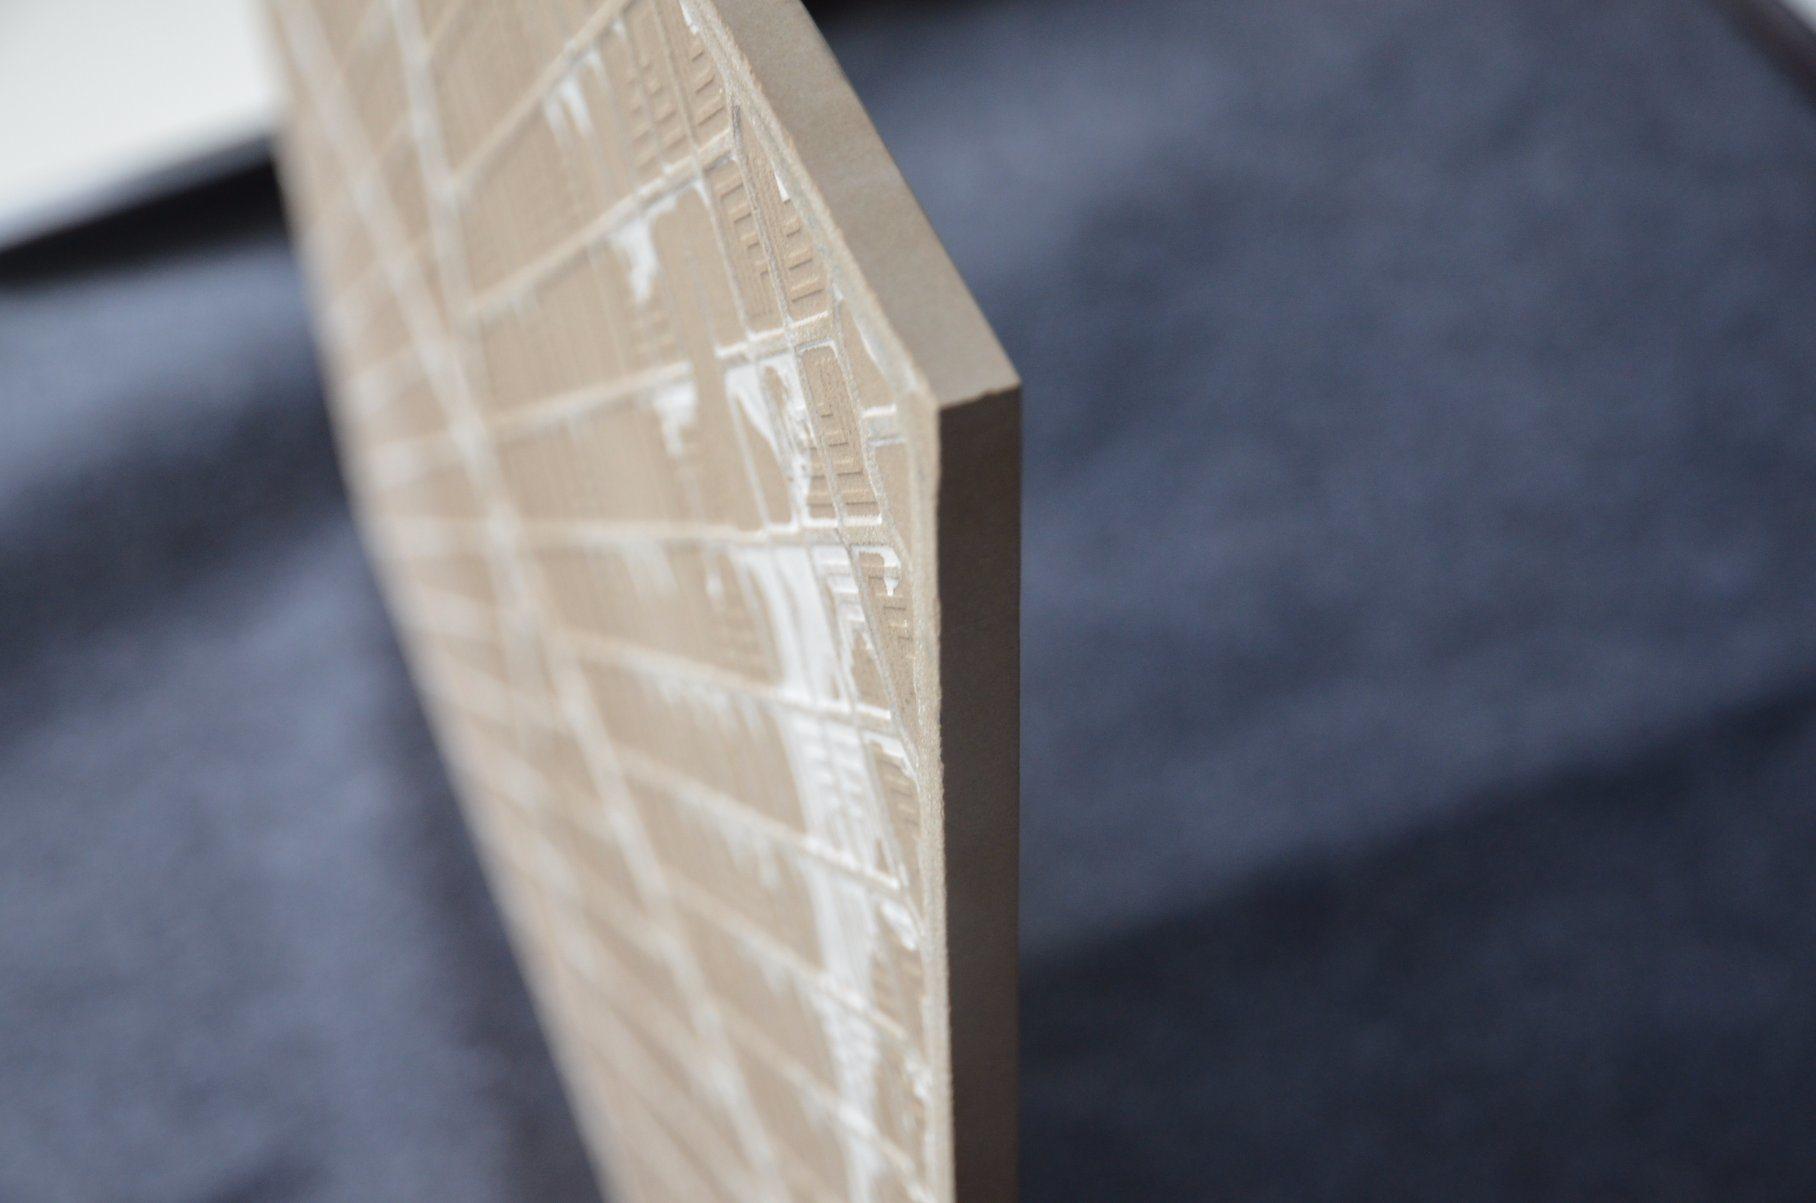 China Good Prices Flooring Rustic Tiles Ceramic Tile Dimensions